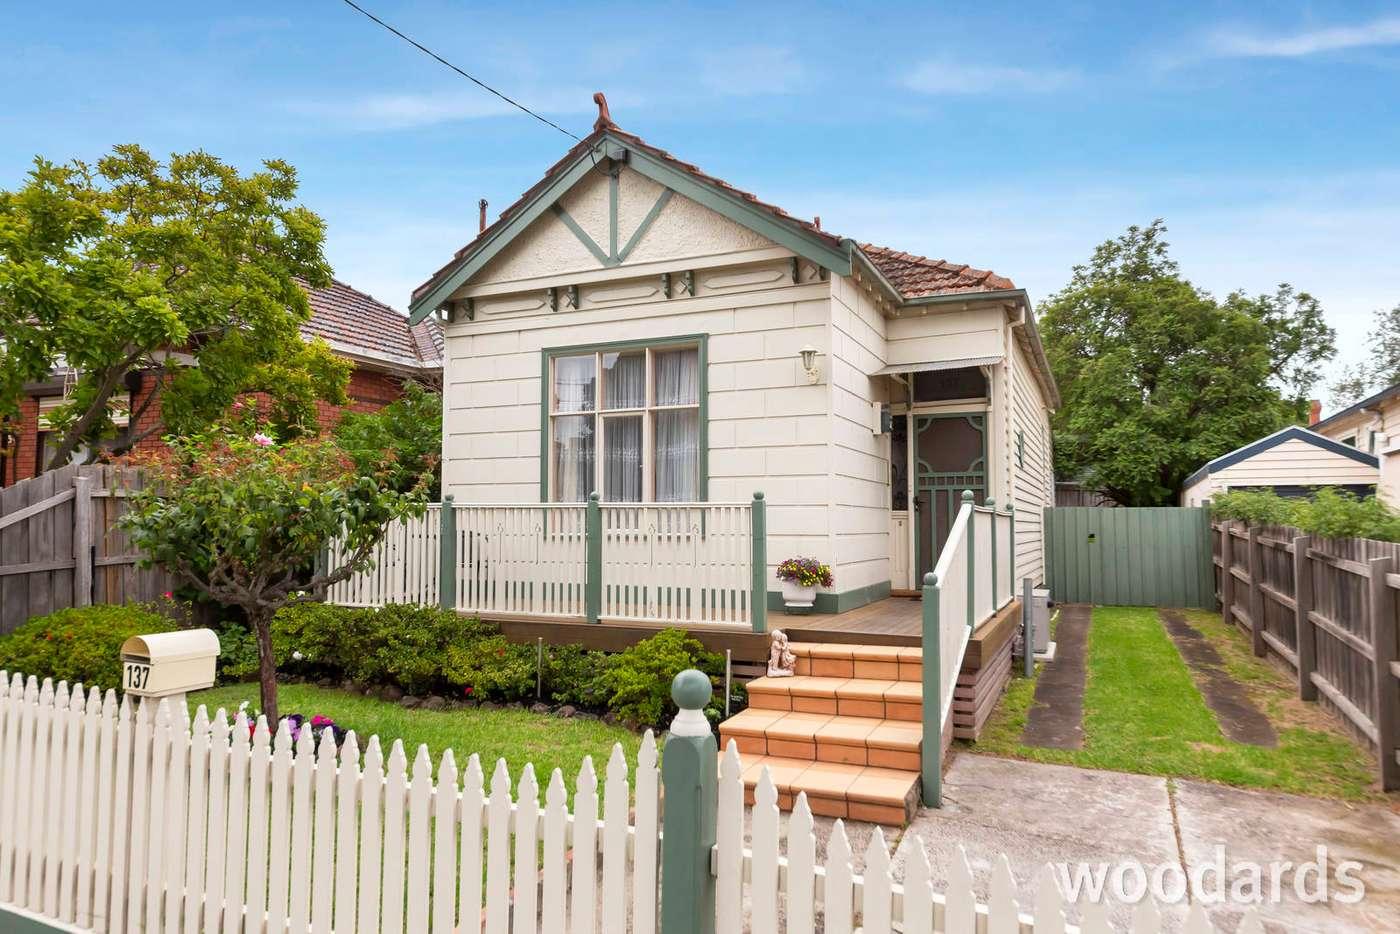 Main view of Homely house listing, 137 Gooch Street, Thornbury VIC 3071